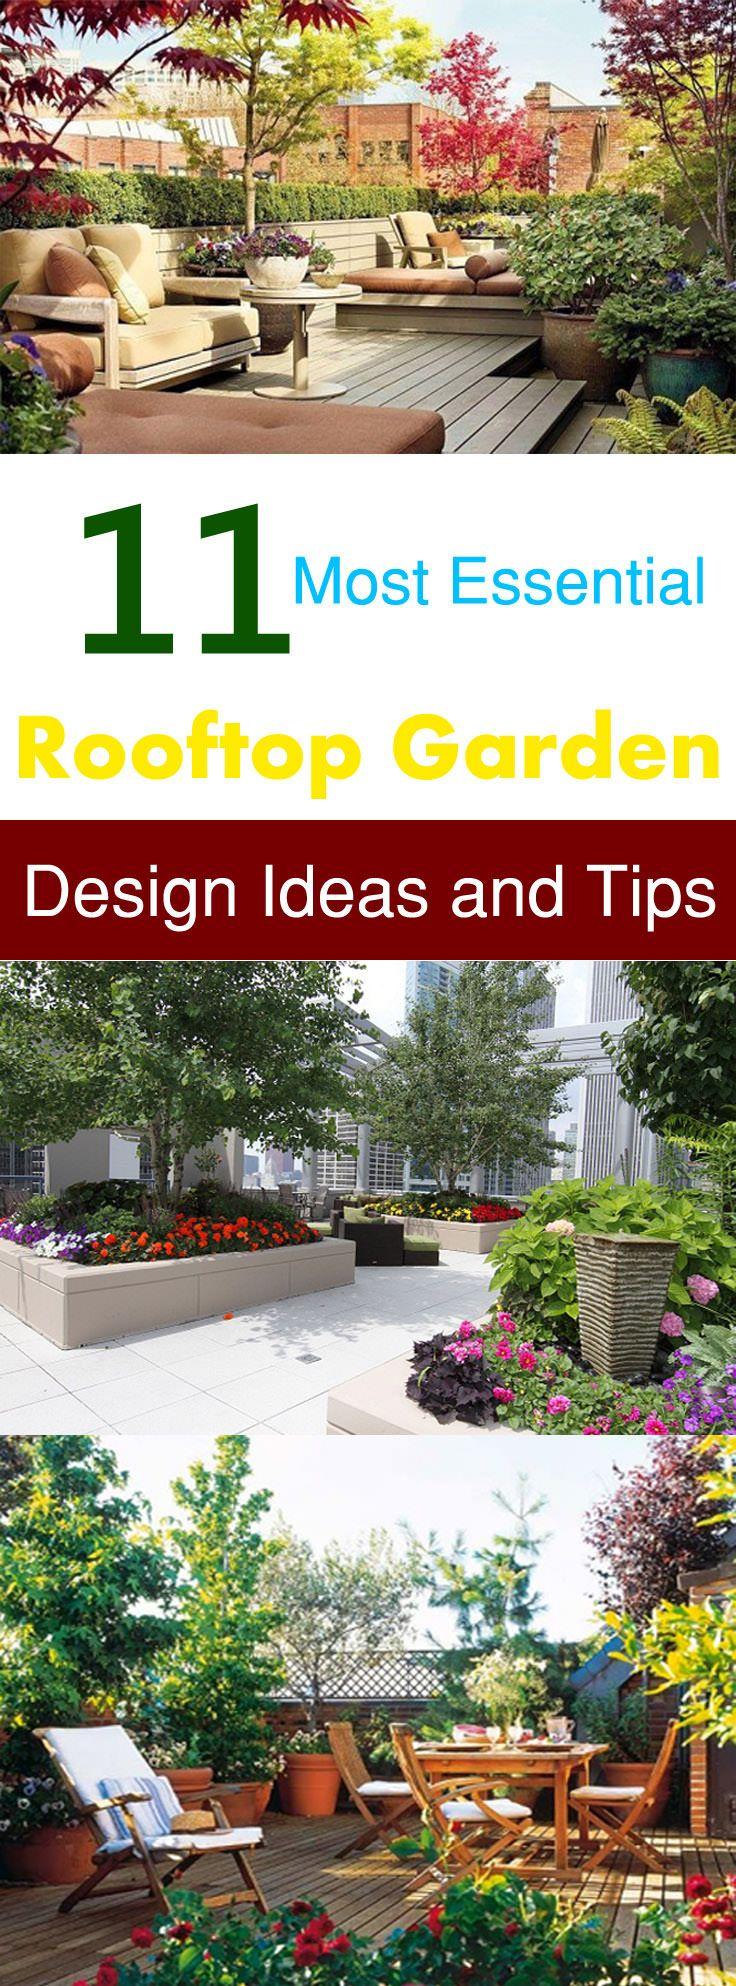 17 Best ideas about Rooftop Gardens on Pinterest | Small terrace, Terrace garden and Terrace